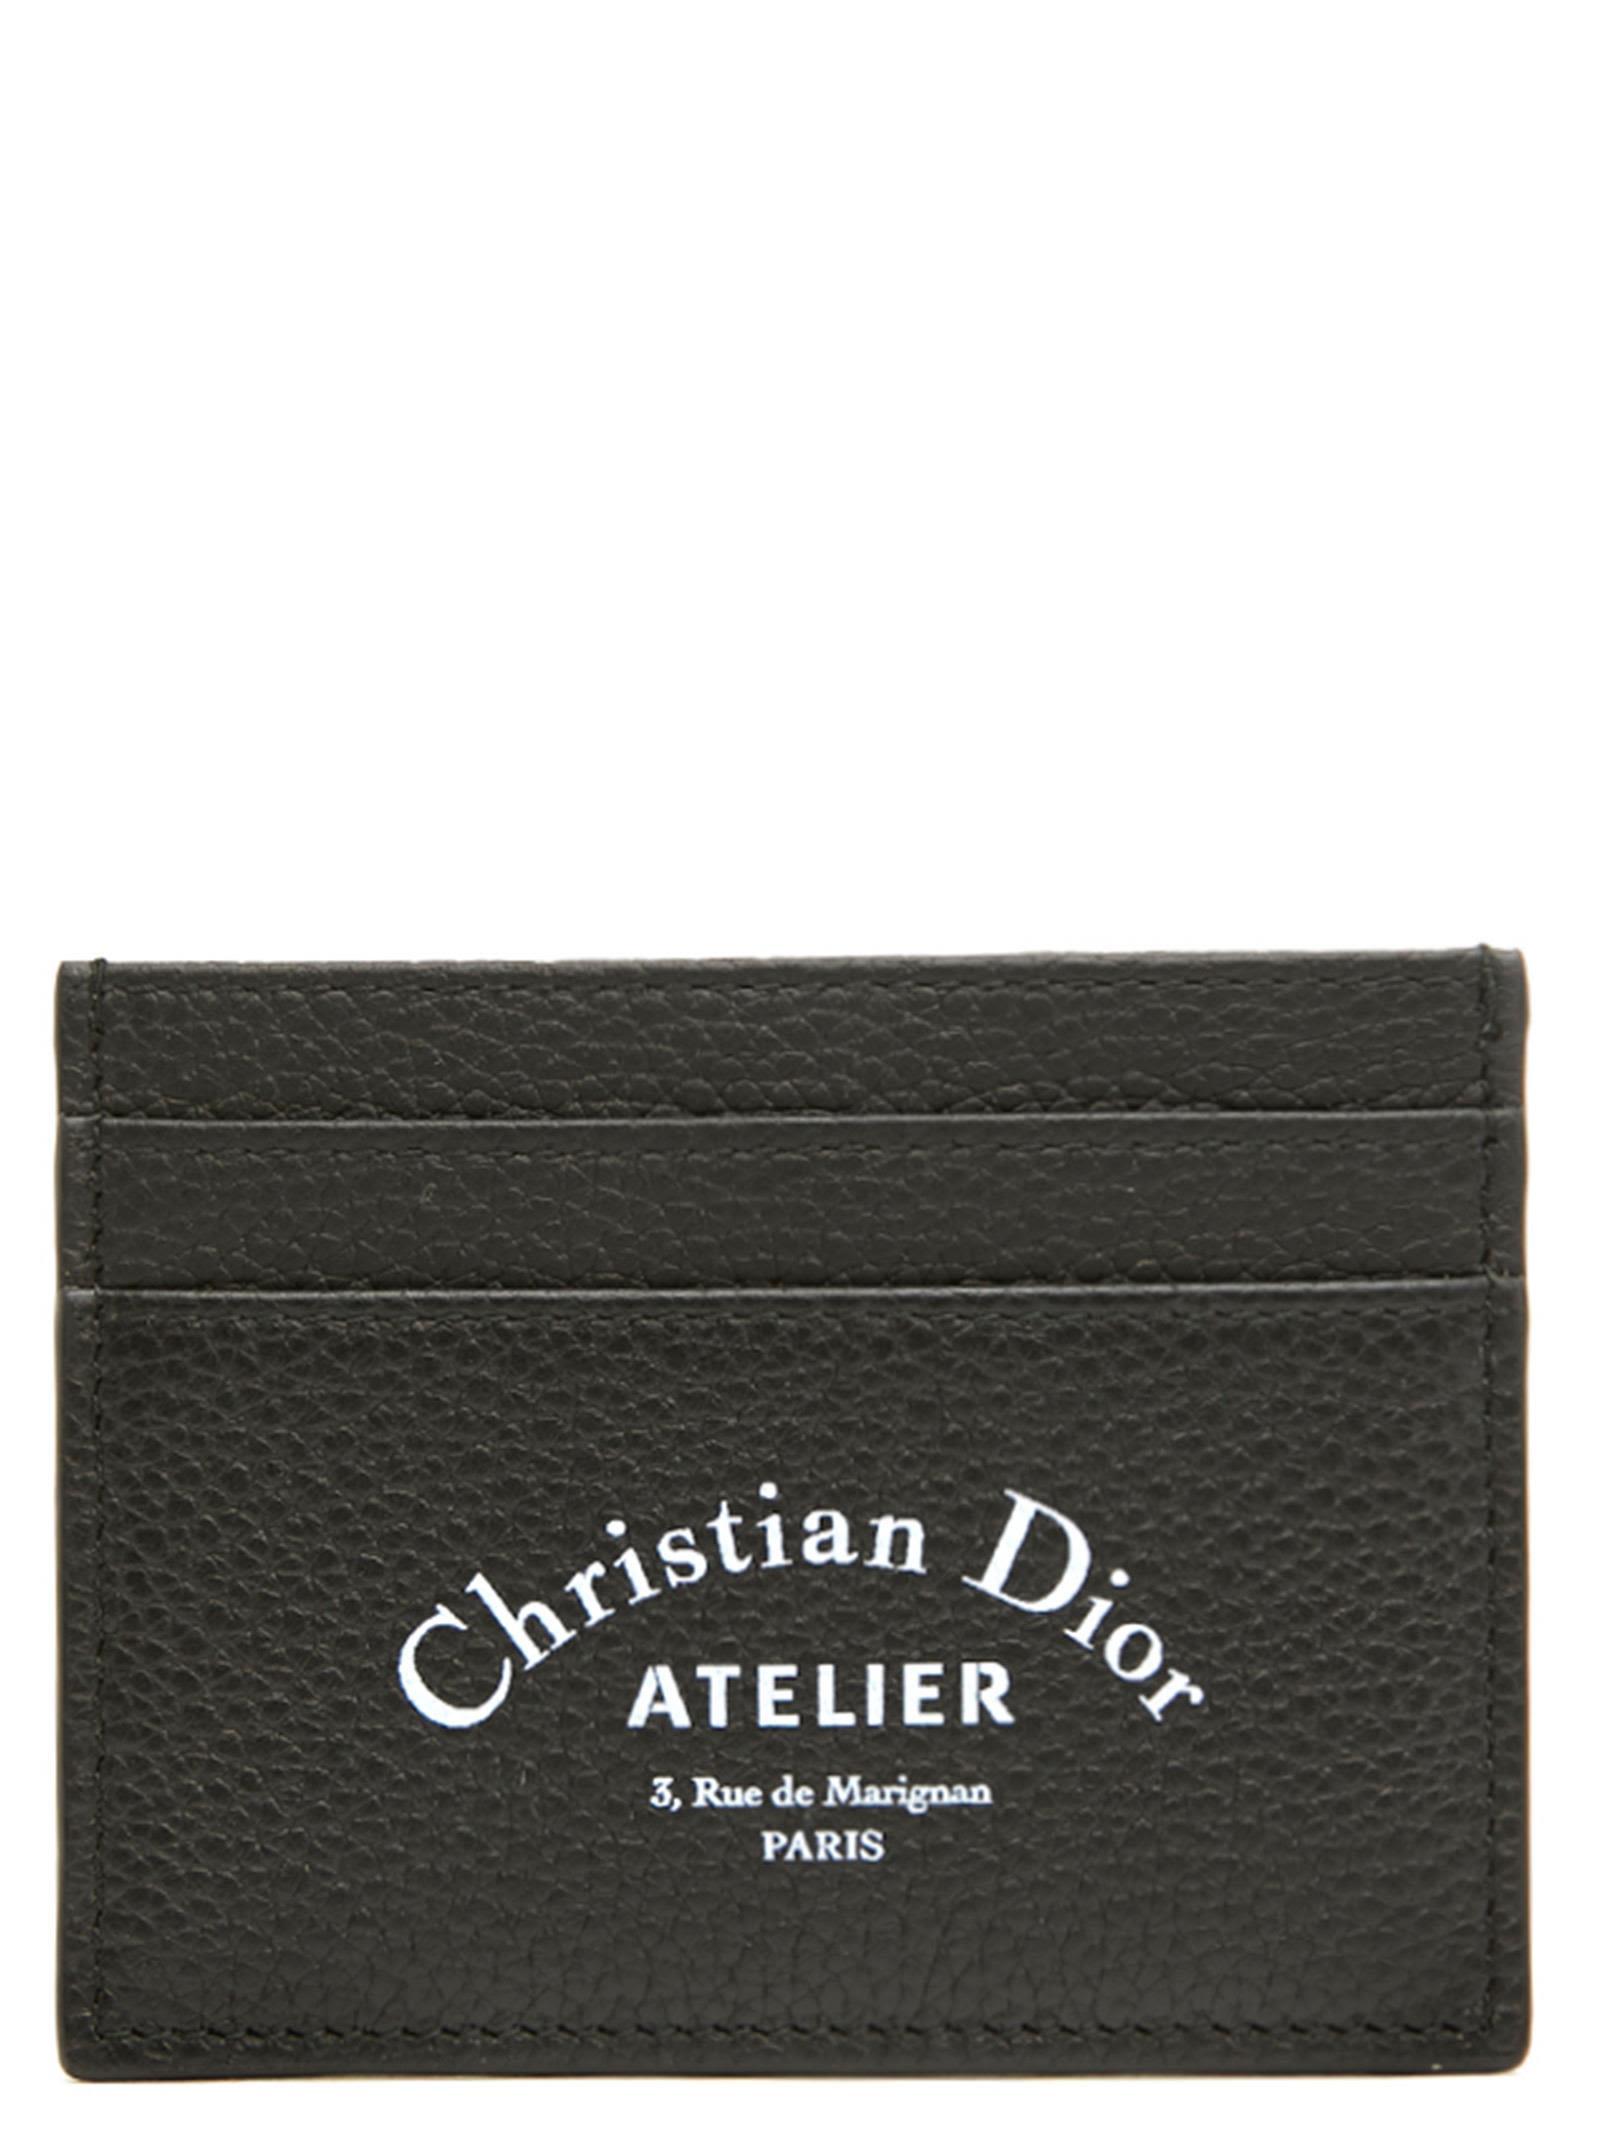 DIOR HOMME 'Dior Atelier' Cardholder in Black